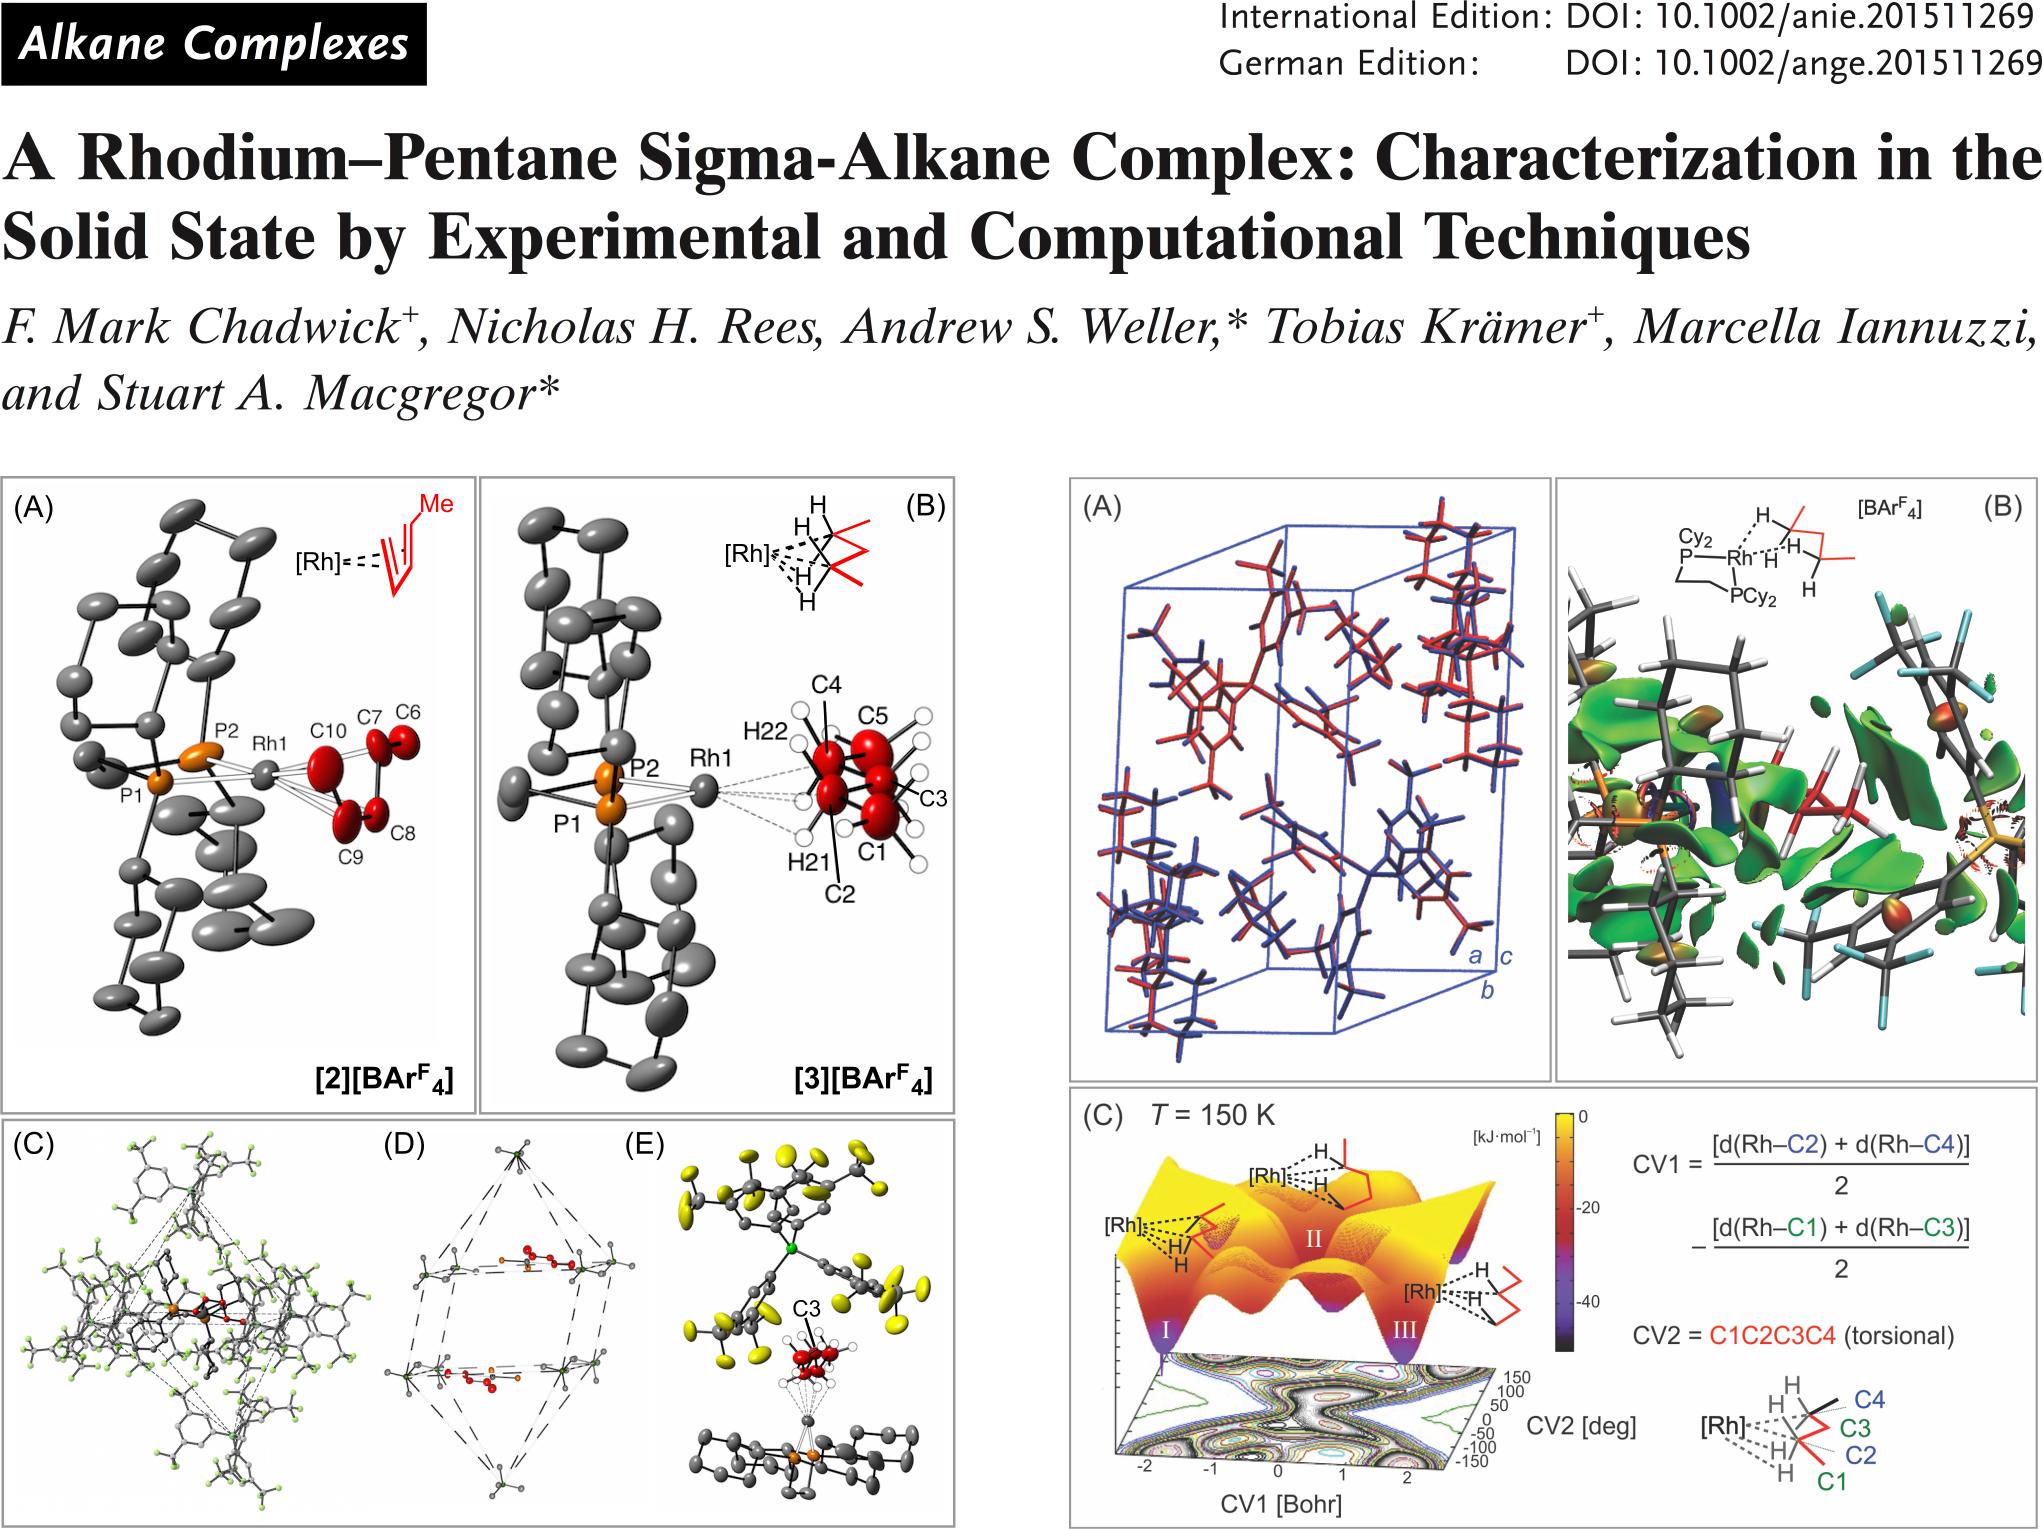 science [CP2K Open Source Molecular Dynamics ]